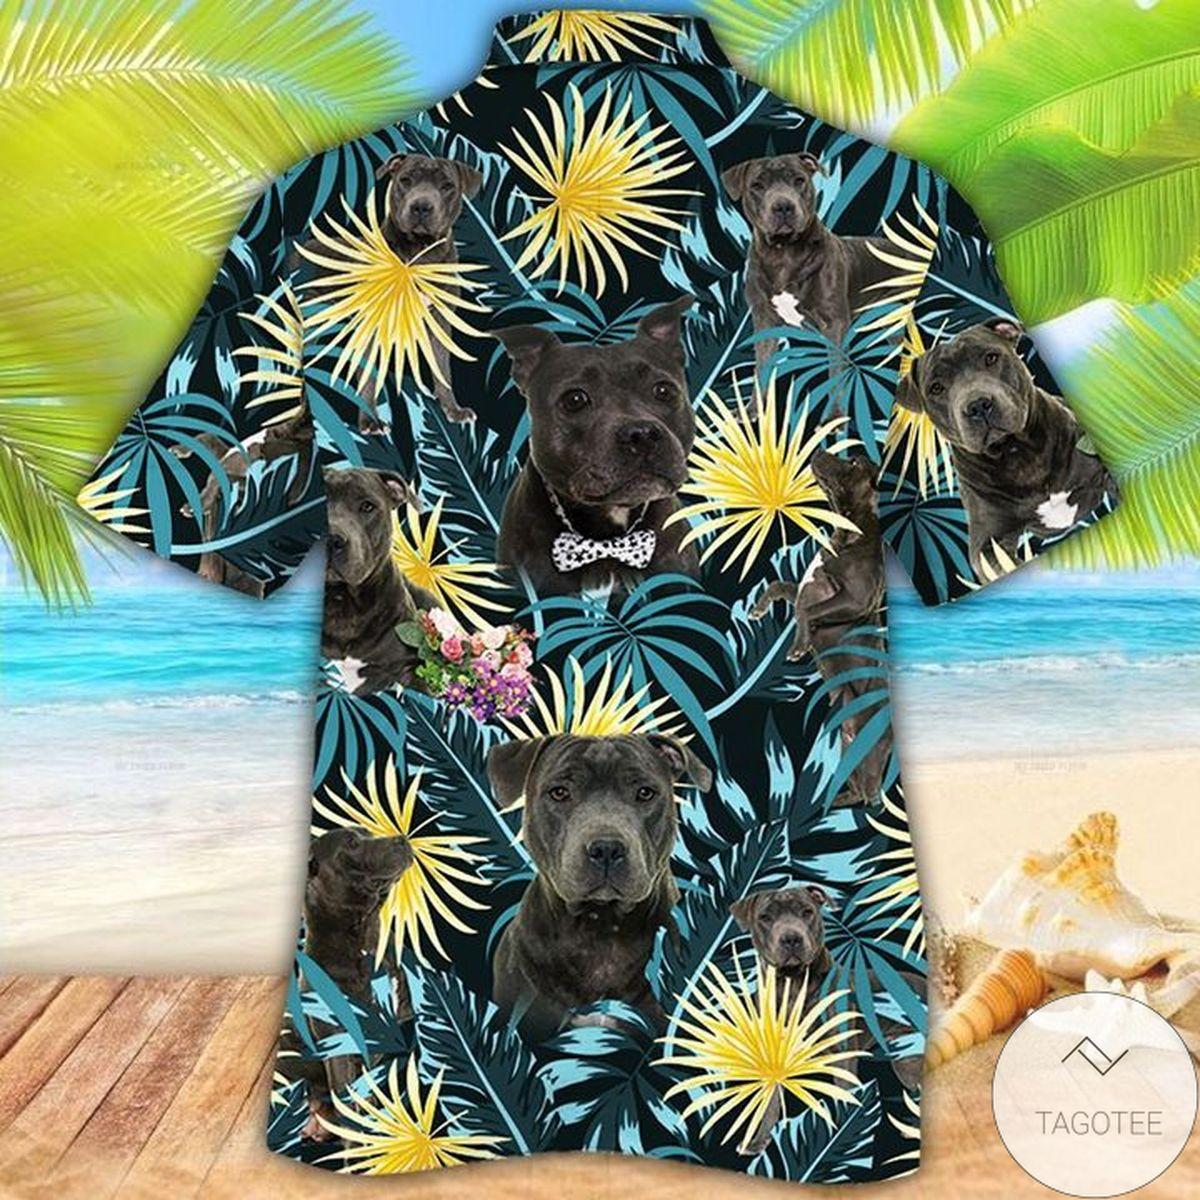 Fantastic Staffordshire Bull Terrier Dog Lovers Blue And Yellow Plants Hawaiian Shirt